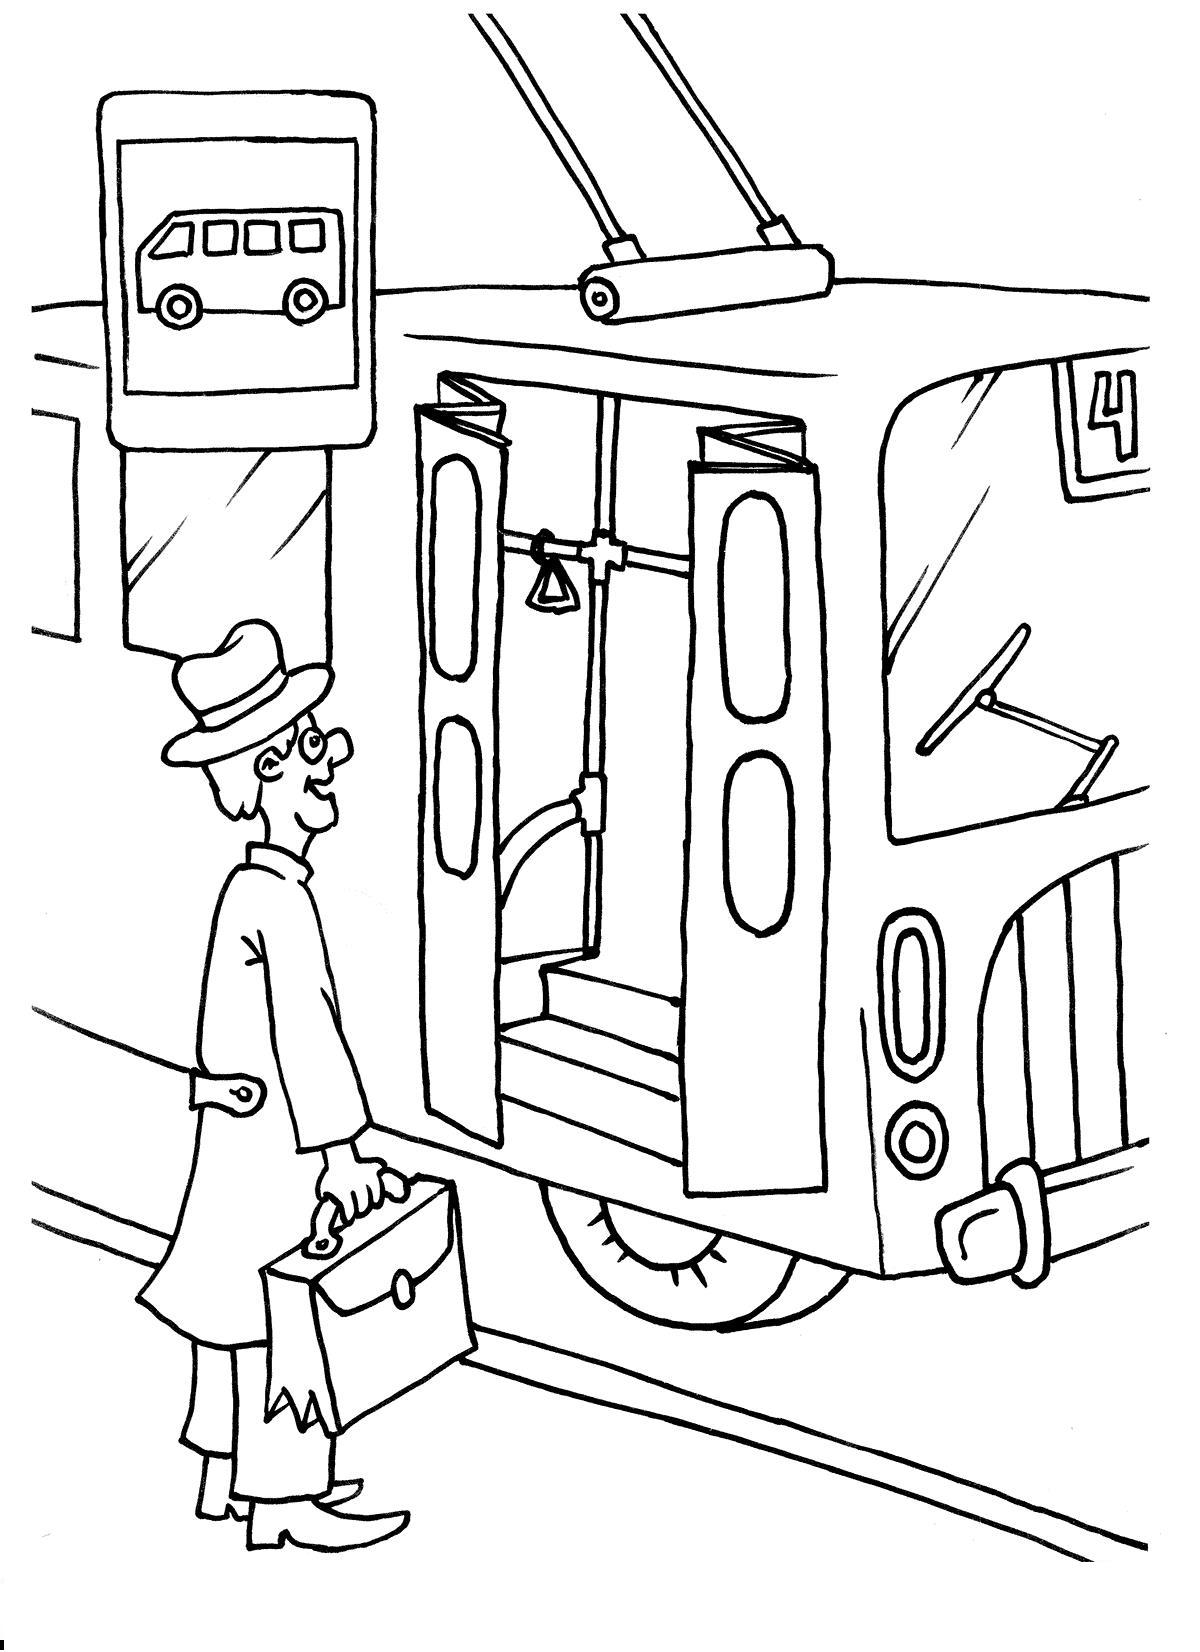 Раскраски троллейбус Раскраски троллейбус, раскраски троллейбусов для детей